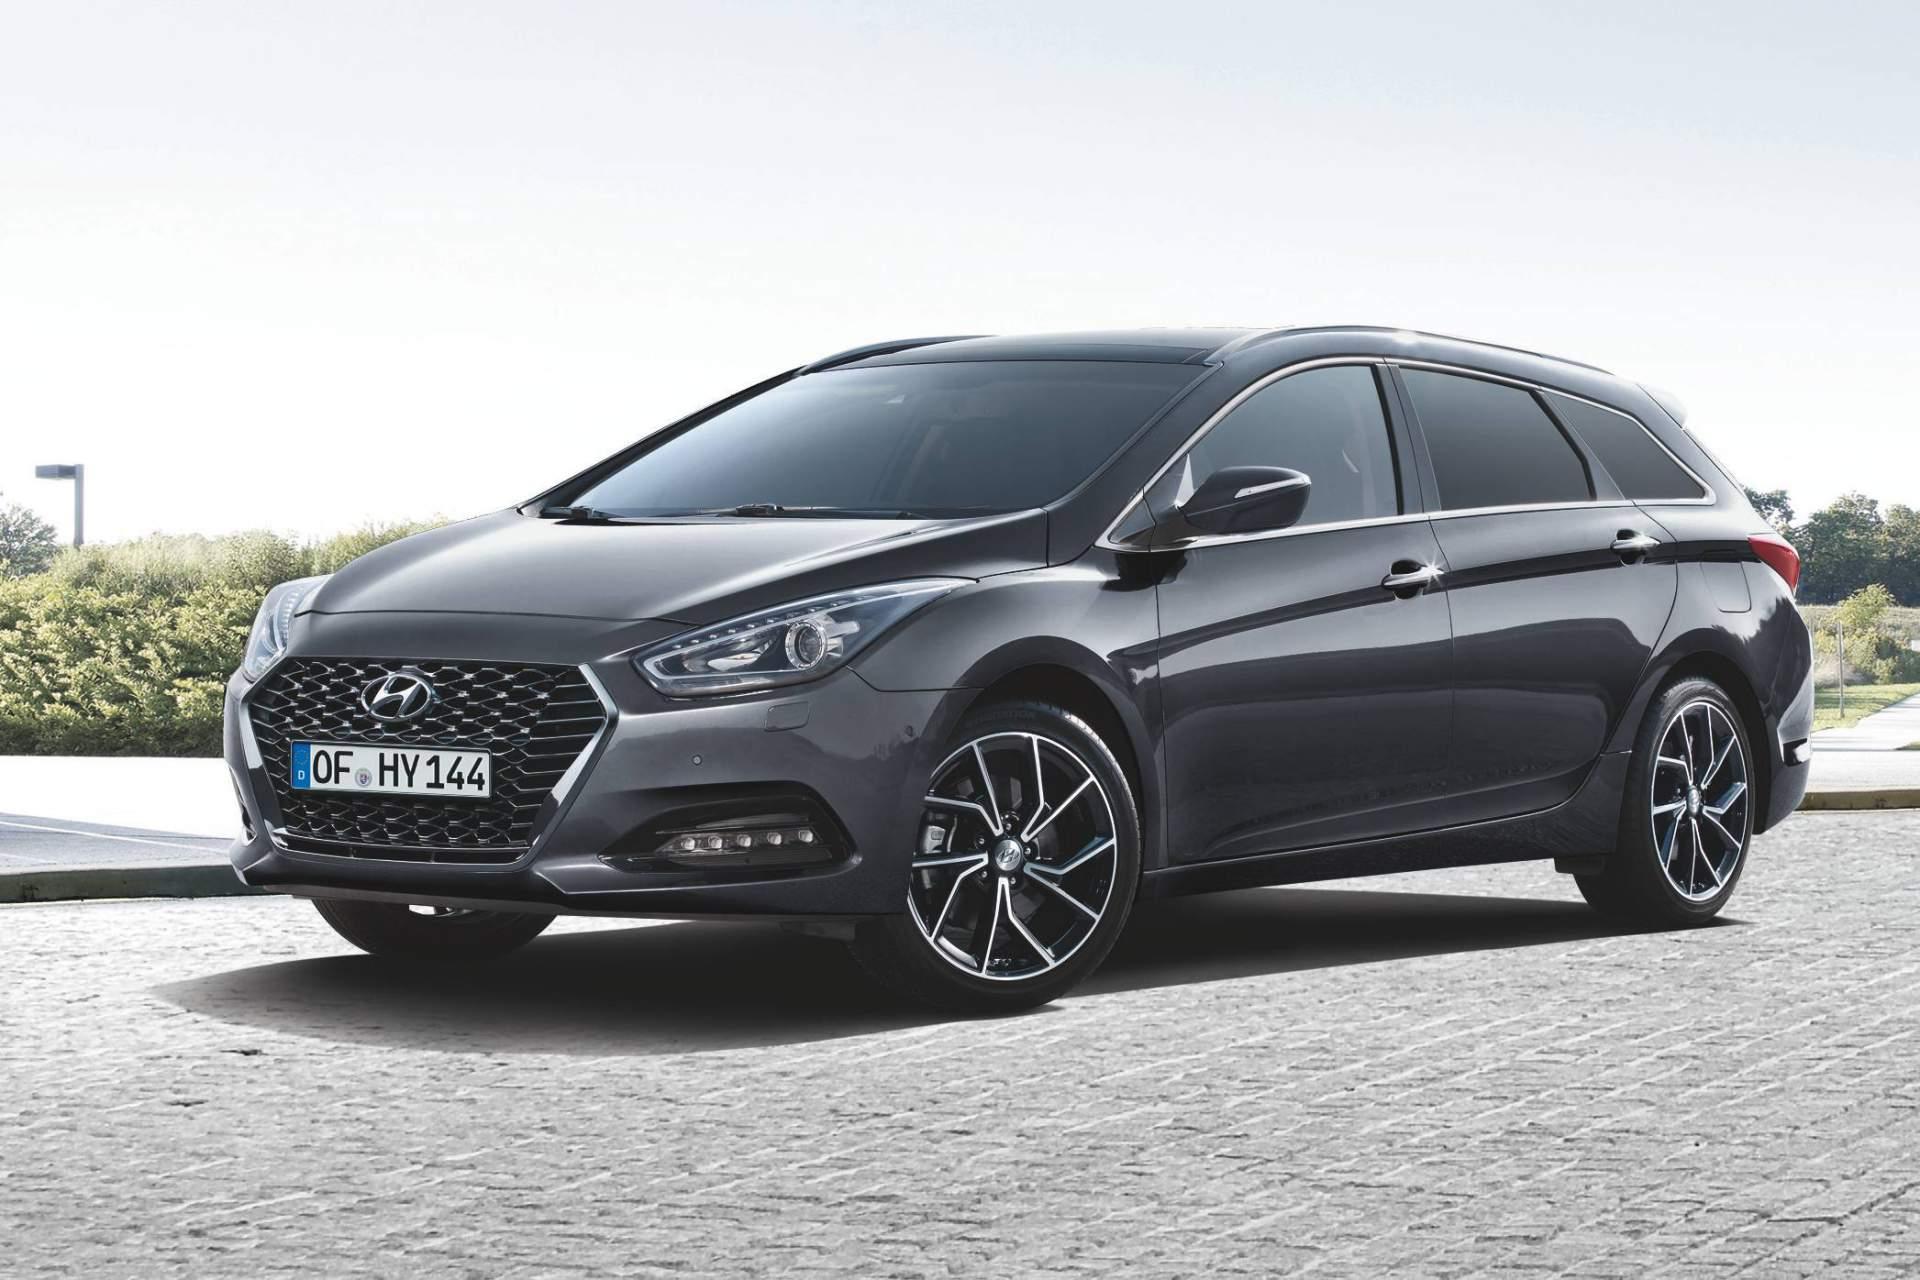 2019_Hyundai_i40_facelift–11